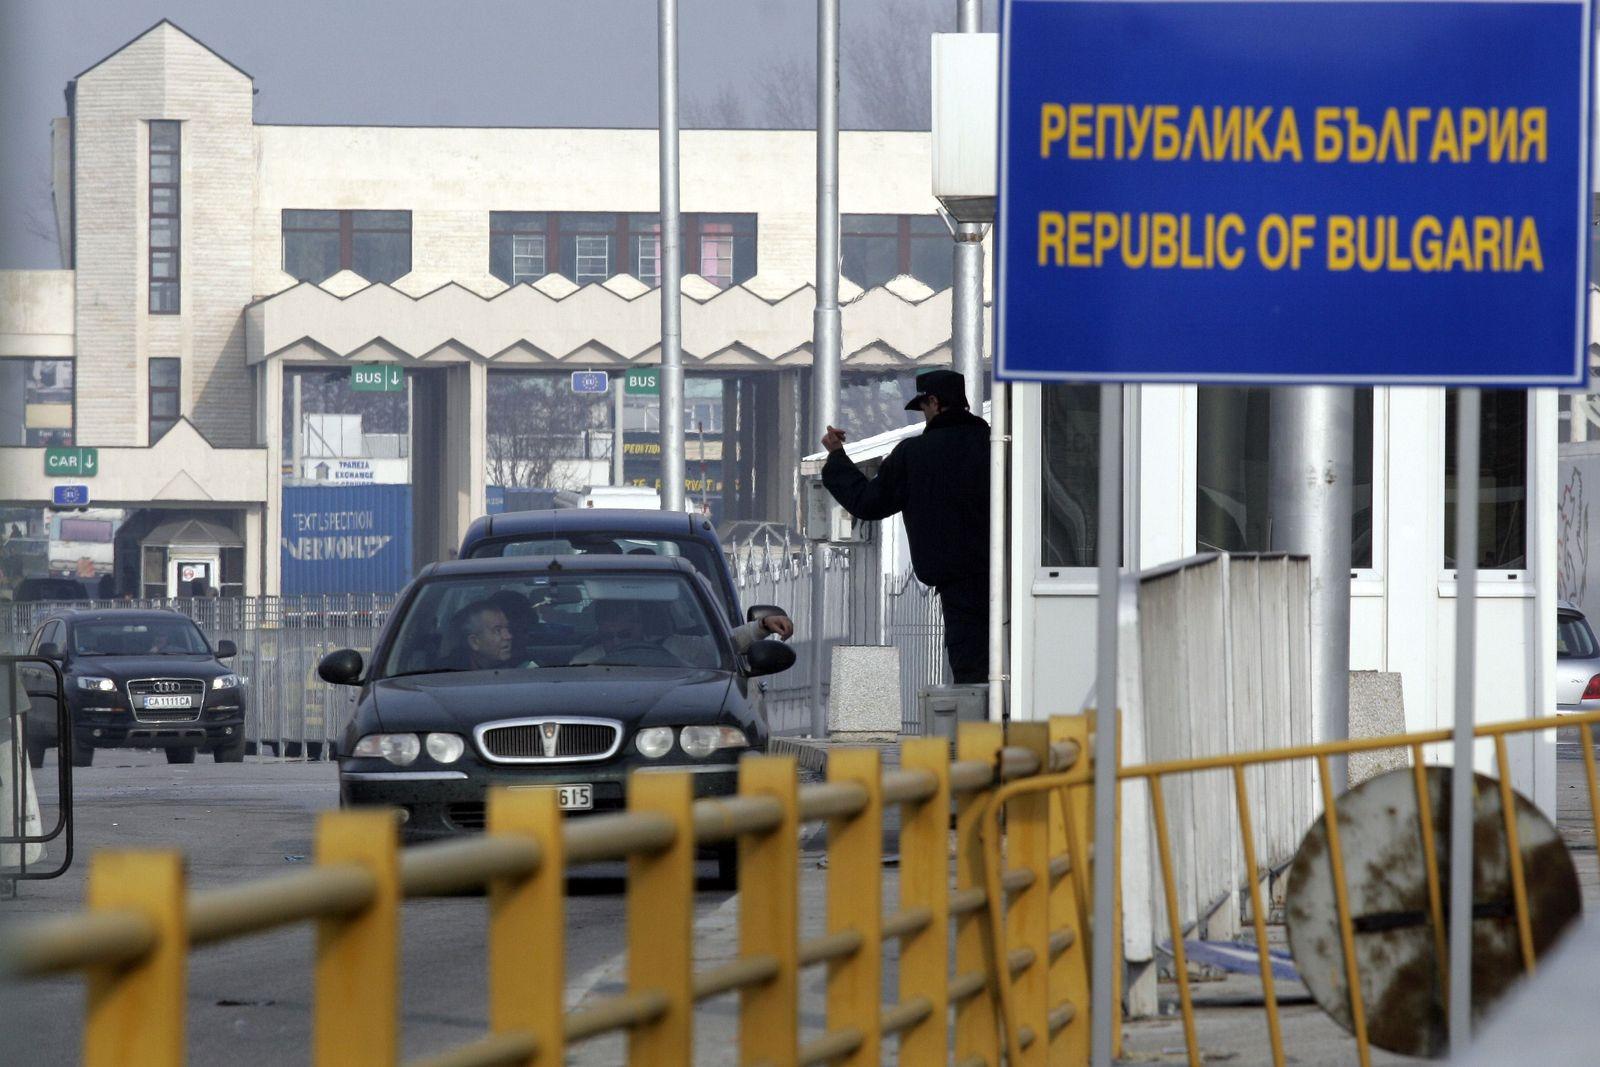 Grenze/ Bulgarien/ Griechenland/ Schengen